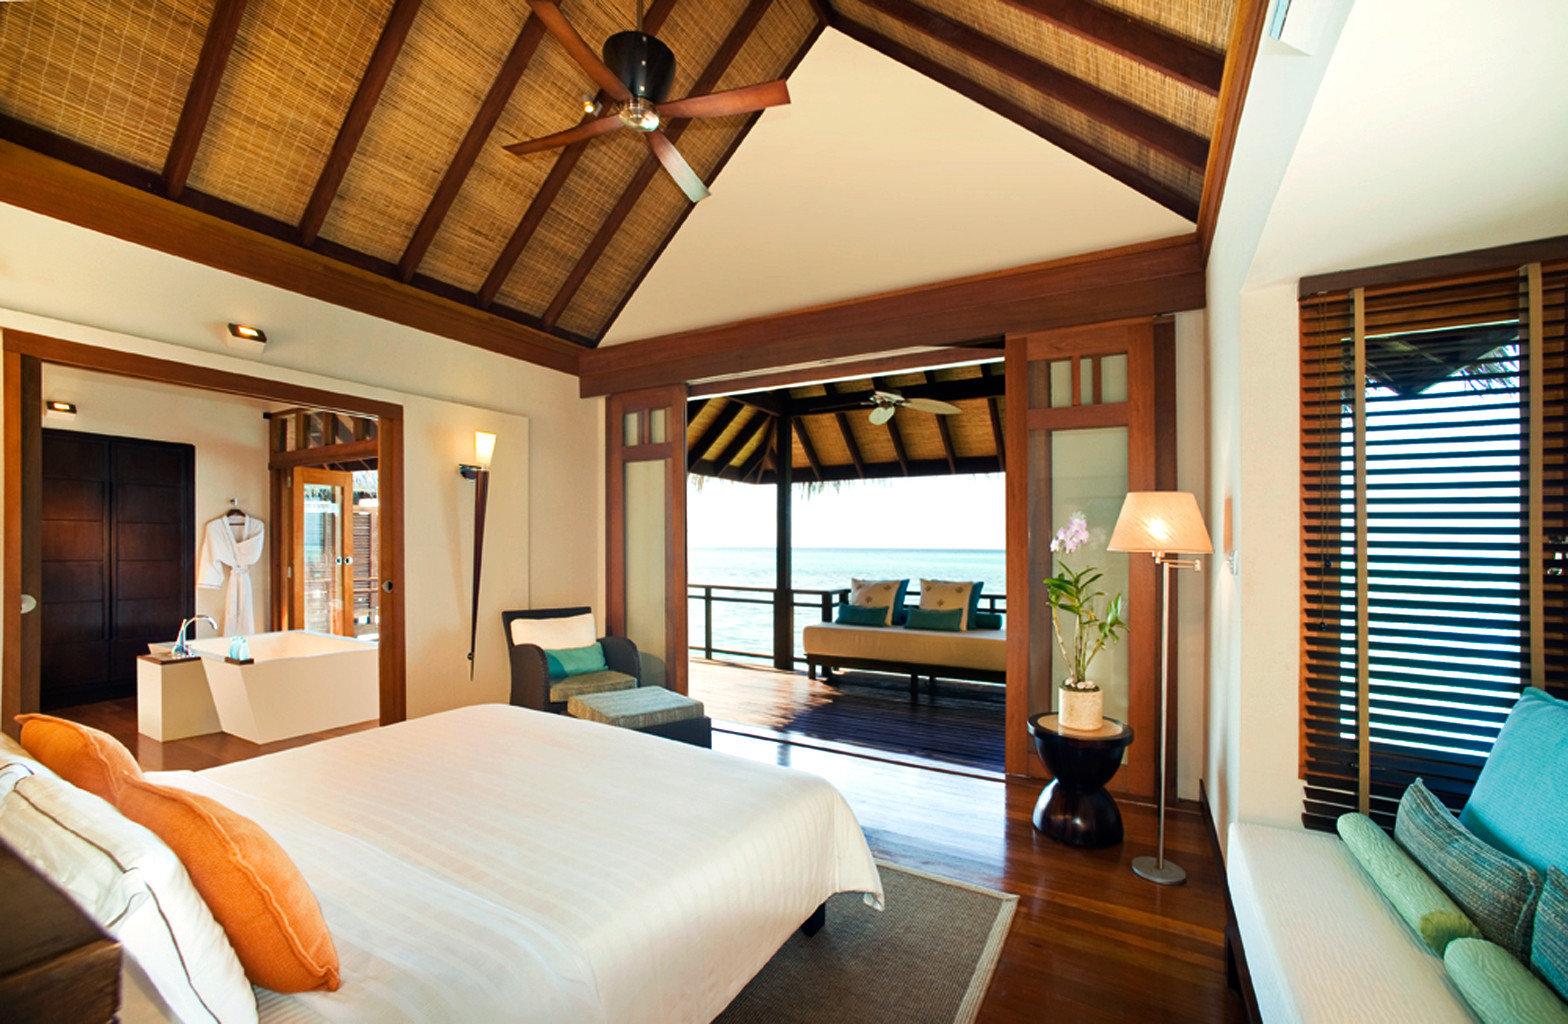 Balcony Bedroom Elegant Luxury Modern Scenic views Suite sofa property Resort cottage home living room Villa flat